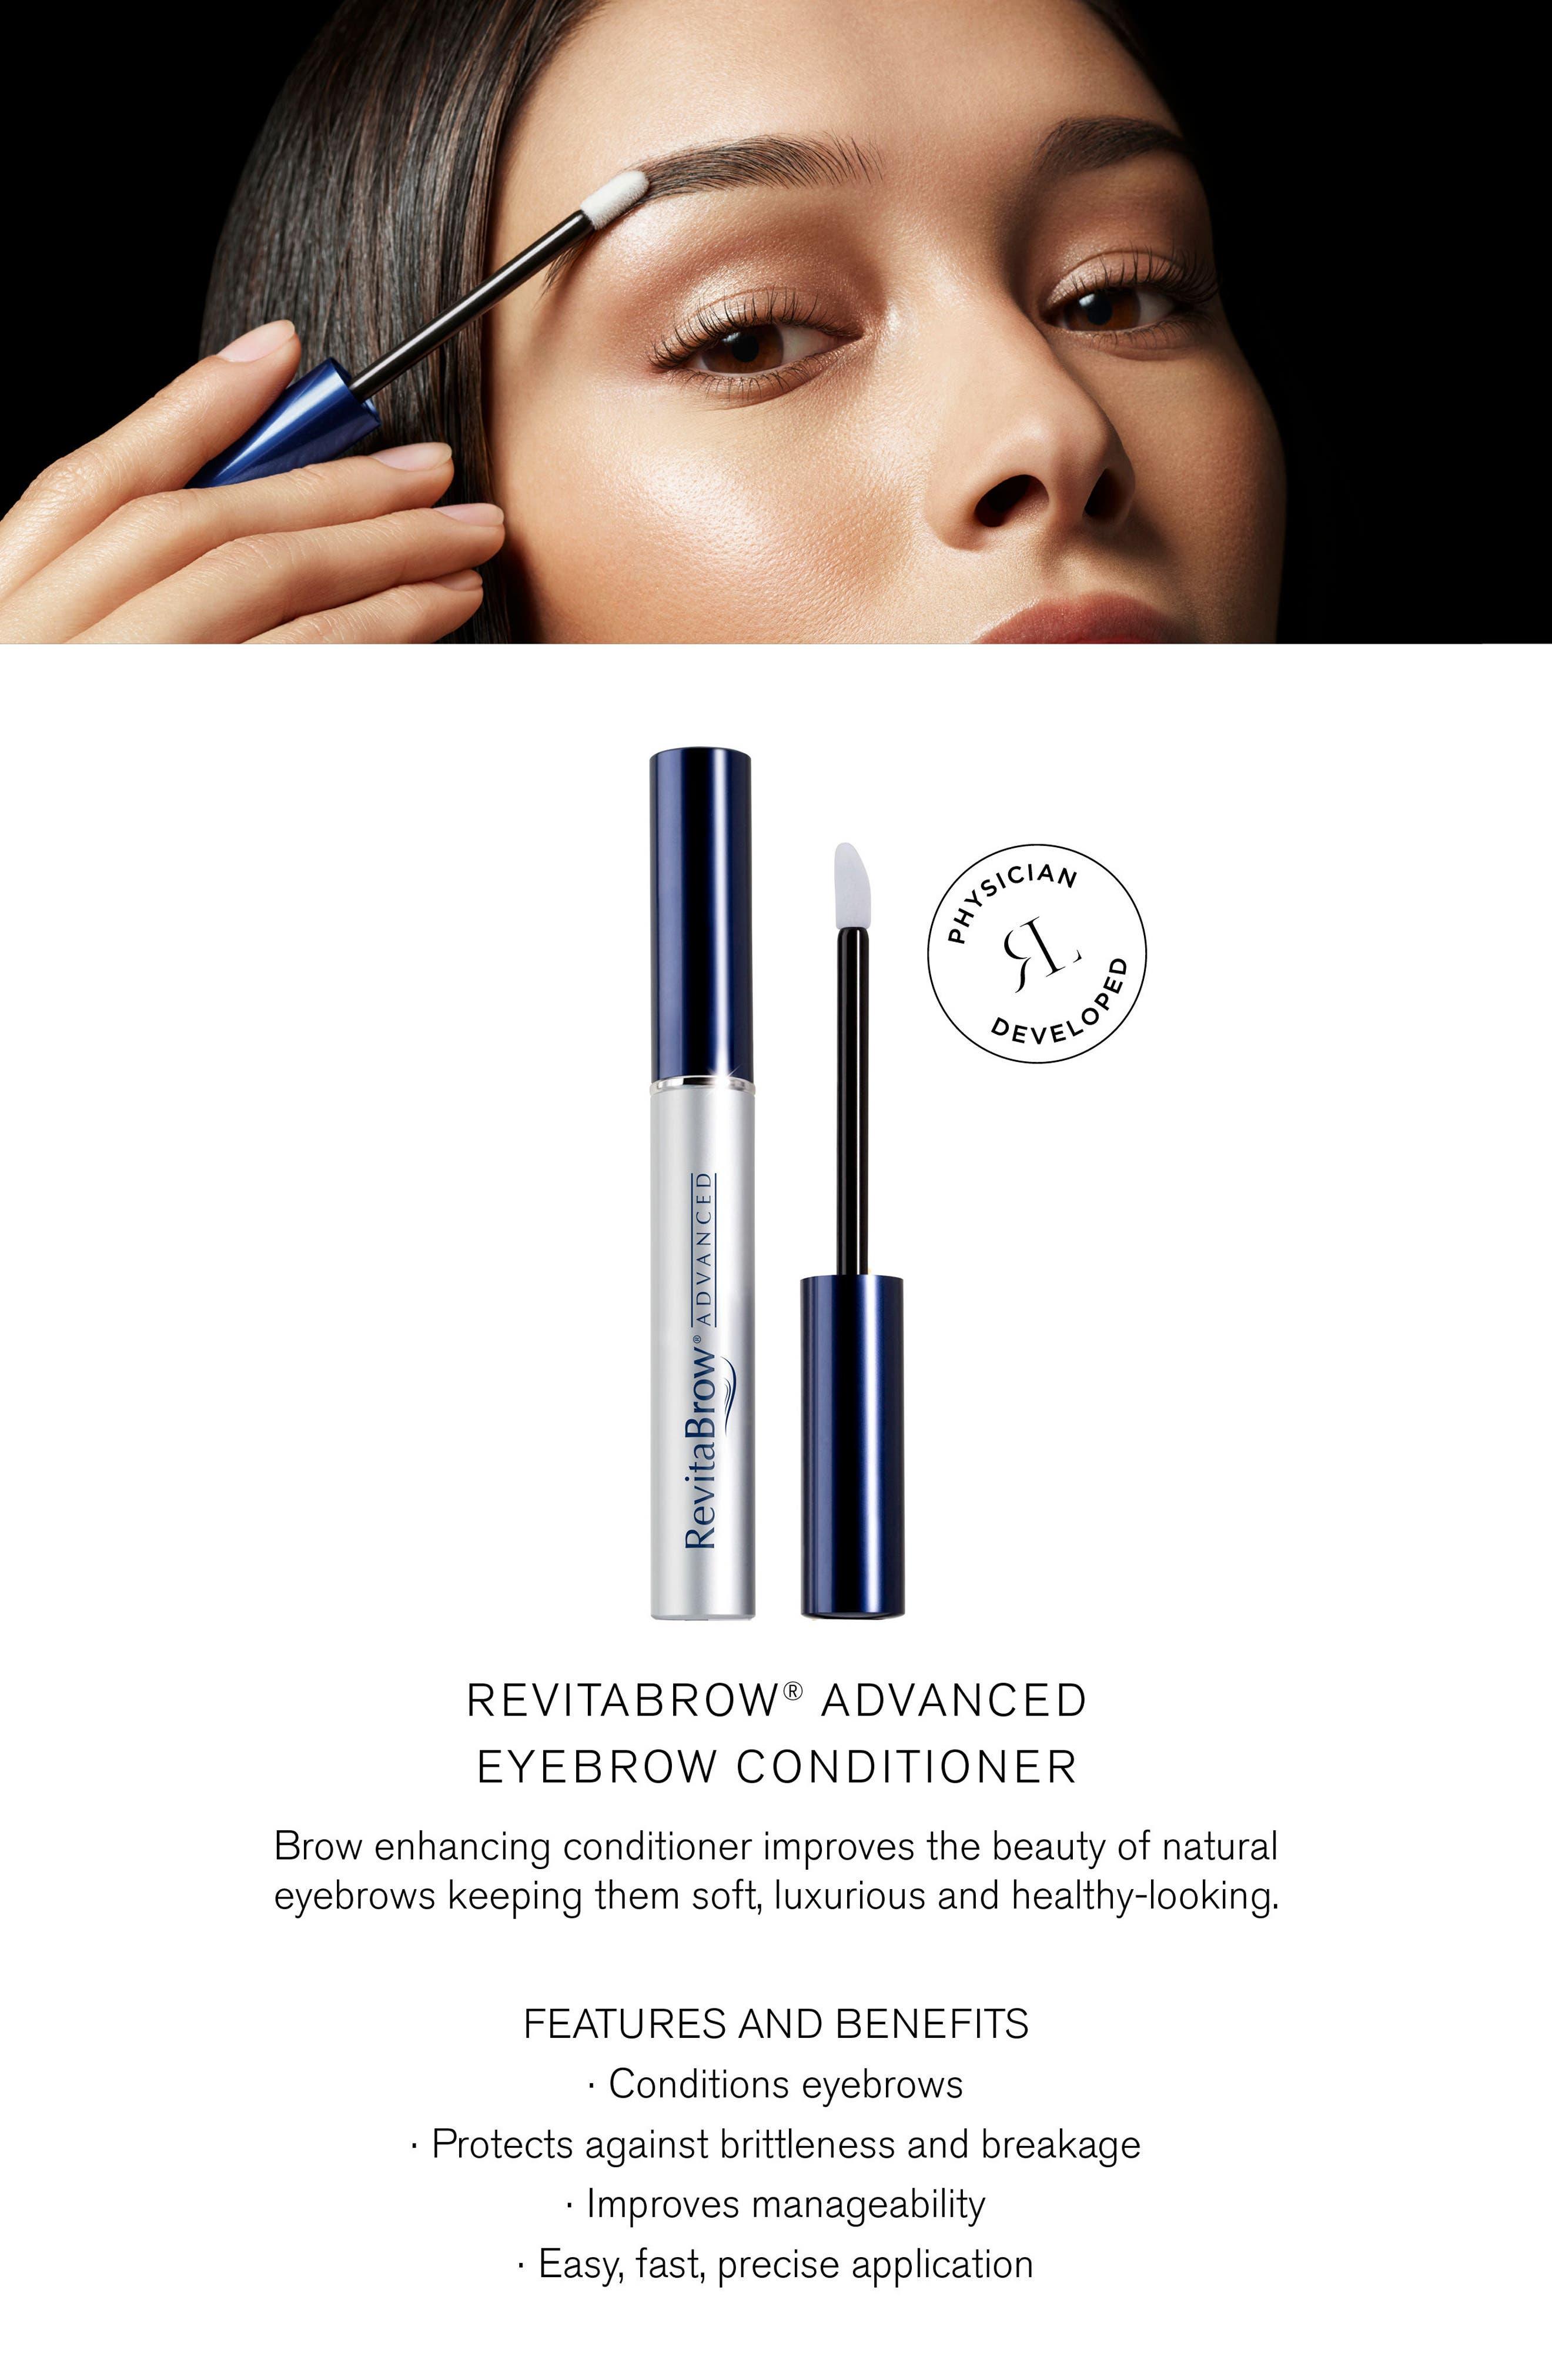 RevitaBrow<sup>®</sup> ADVANCED Eyebrow Conditioner,                             Alternate thumbnail 4, color,                             NO COLOR